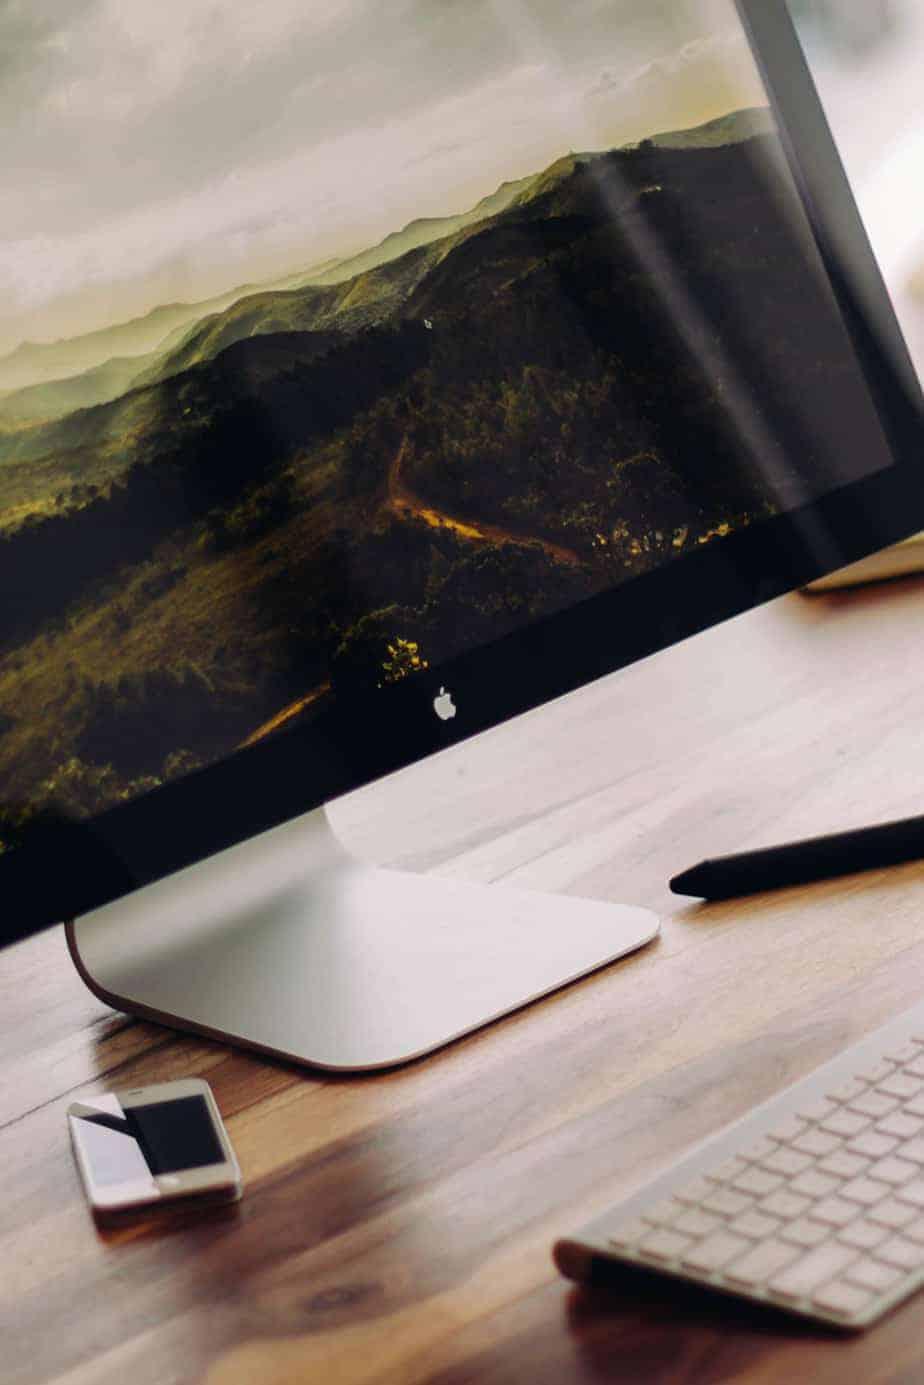 iMac Repair specialist Cardiff NiwTech